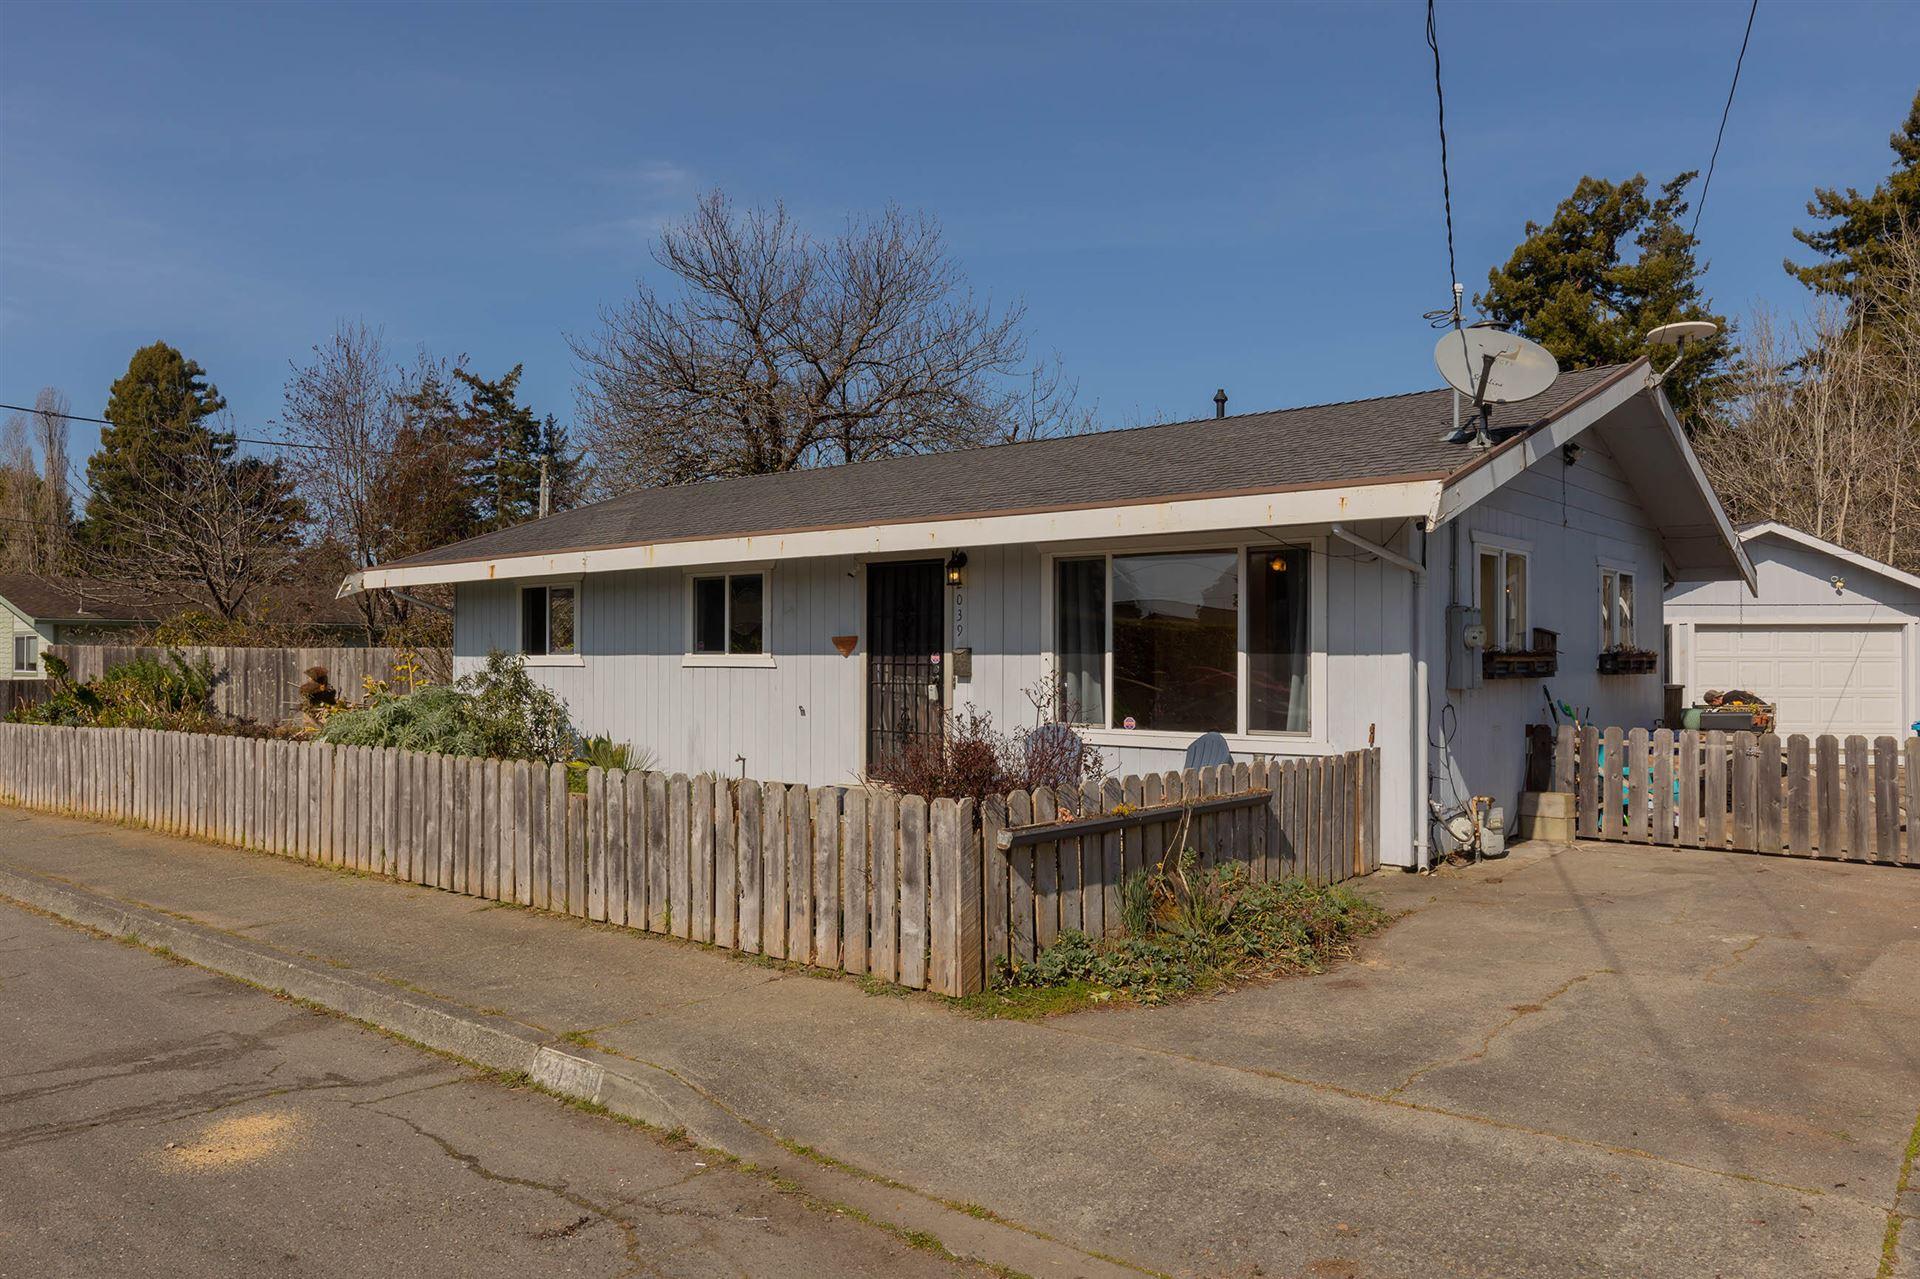 2039 Holly Street, Eureka, CA 95503 - MLS#: 258442